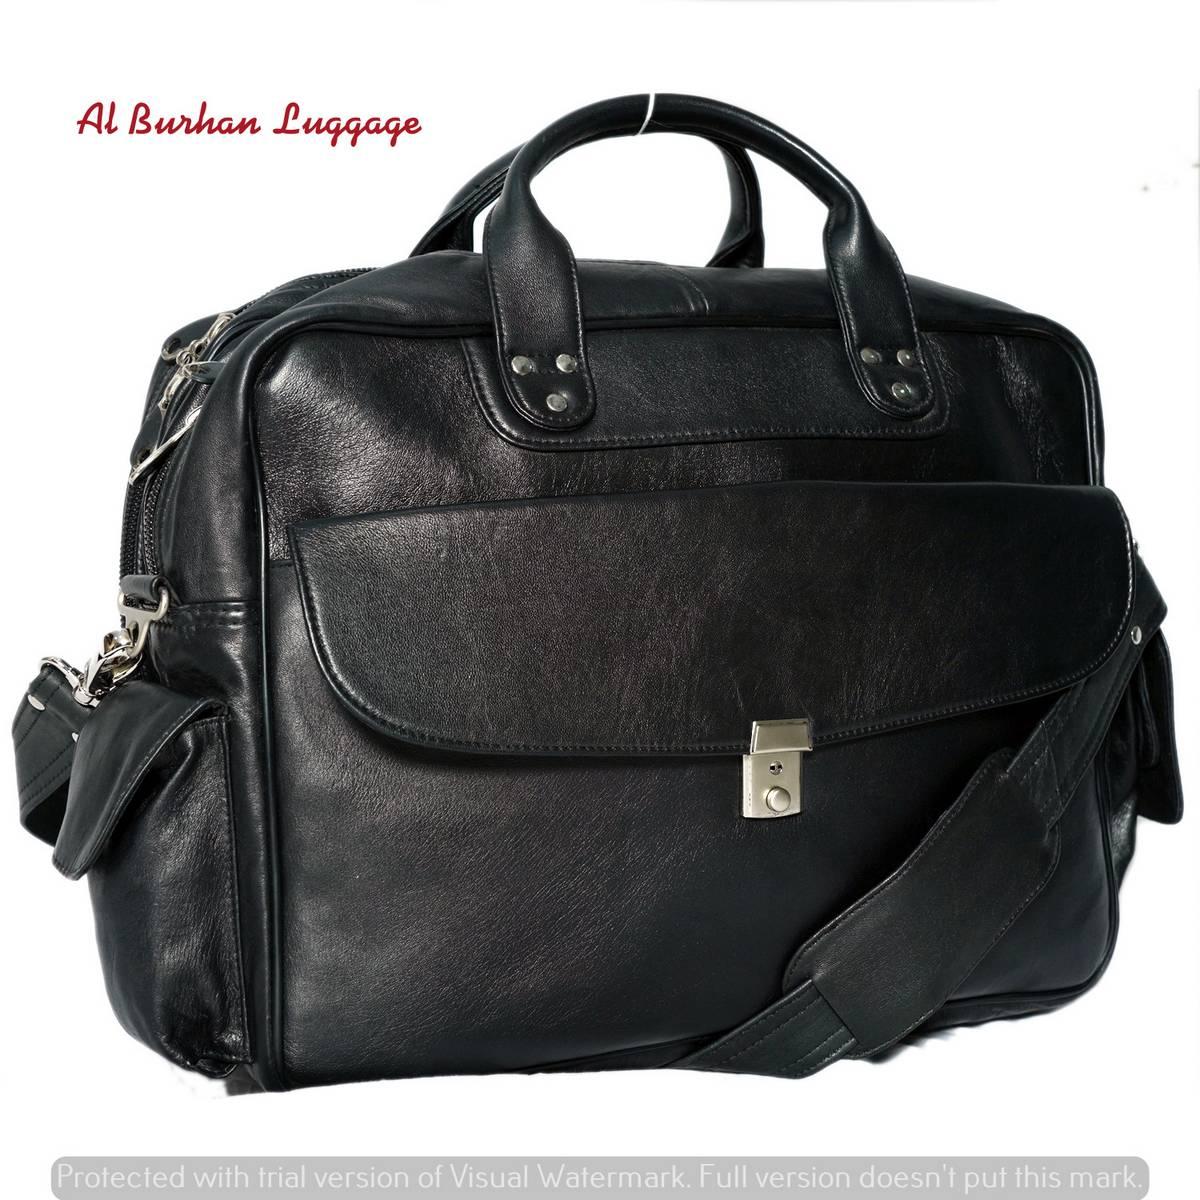 Genuine Leather Business Messenger Women Men Bag, Tote Briefcase For Documents A4, Shoulder Handbag Male Female Laptop Brief Case - BLACK